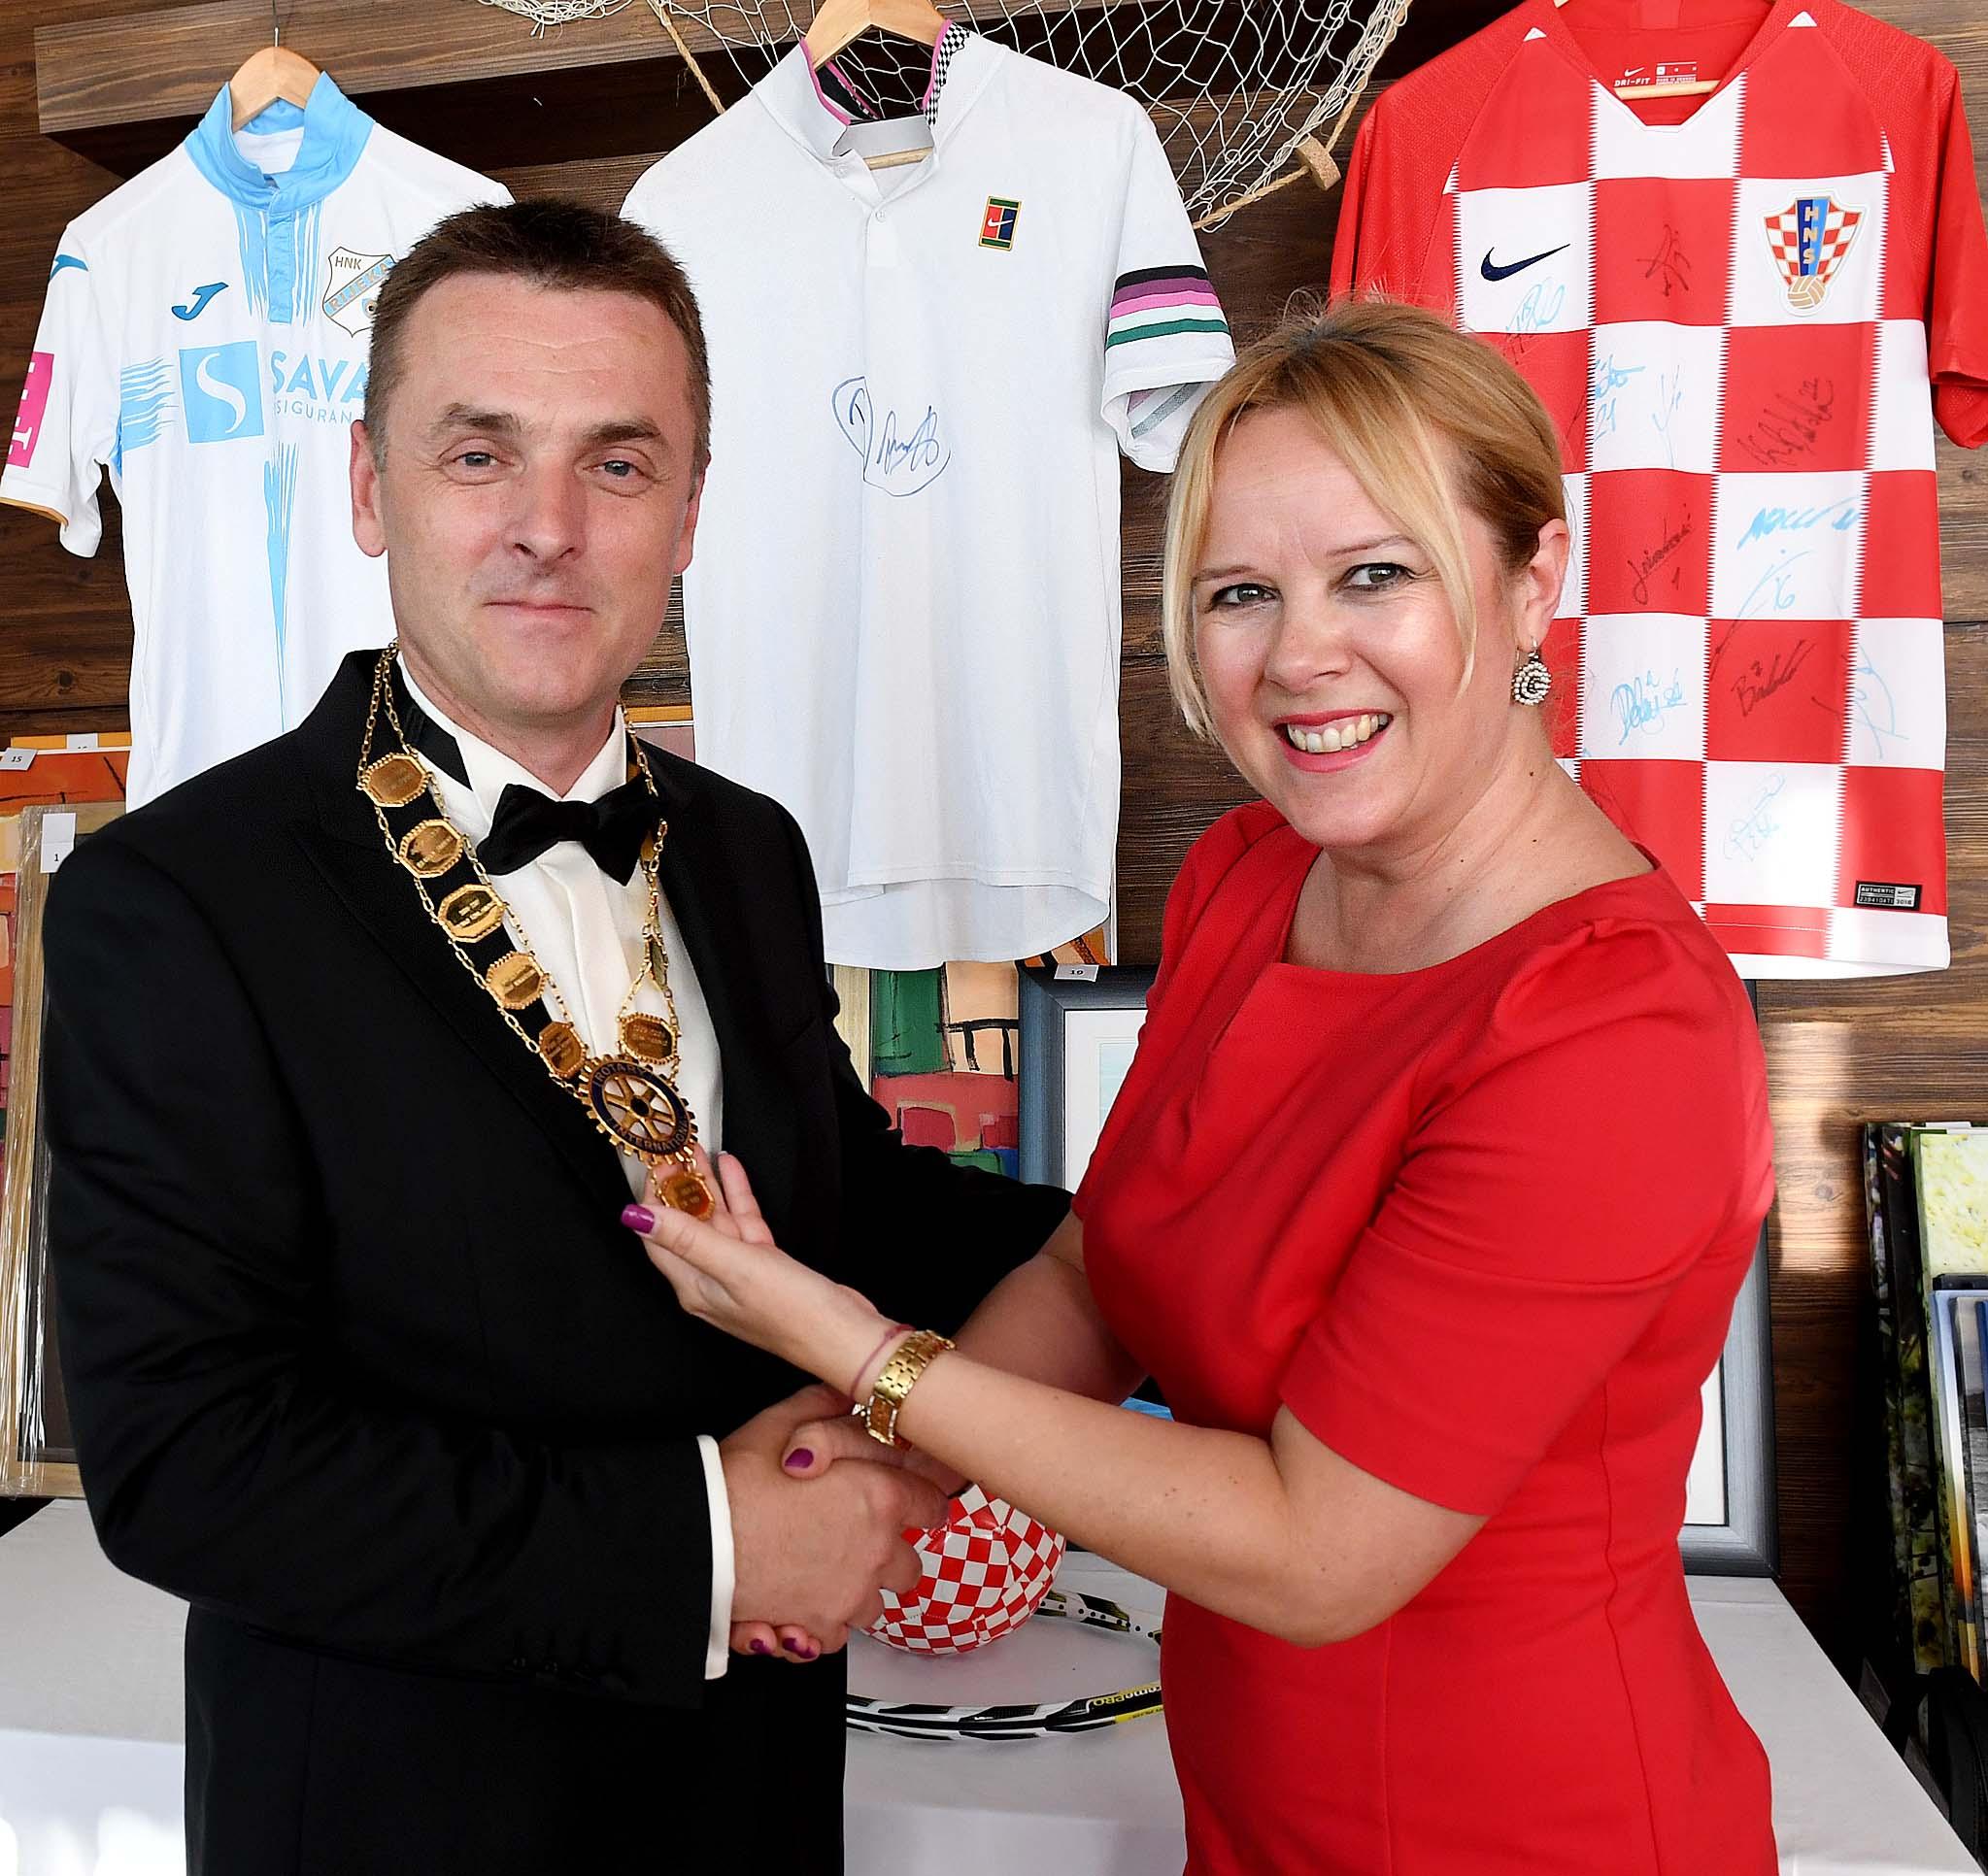 Aukcijska večer riječkog Rotary cluba, Zlatan Car dobio kolajnu od Amire Predovan / Foto Ivica TOMIĆ